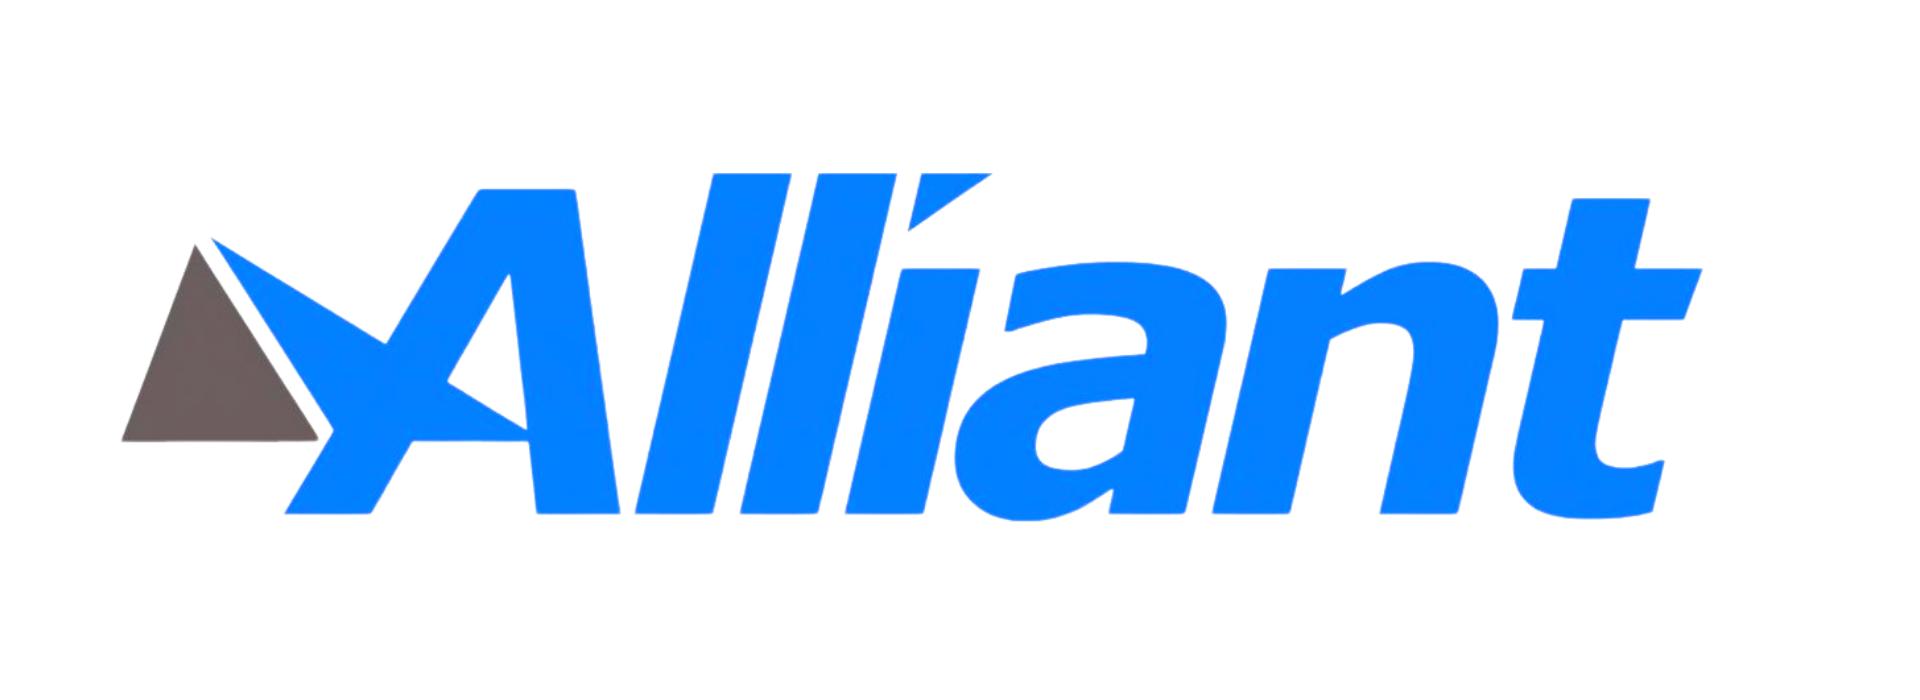 Назревающий конфликт с участием Alliant Insurance